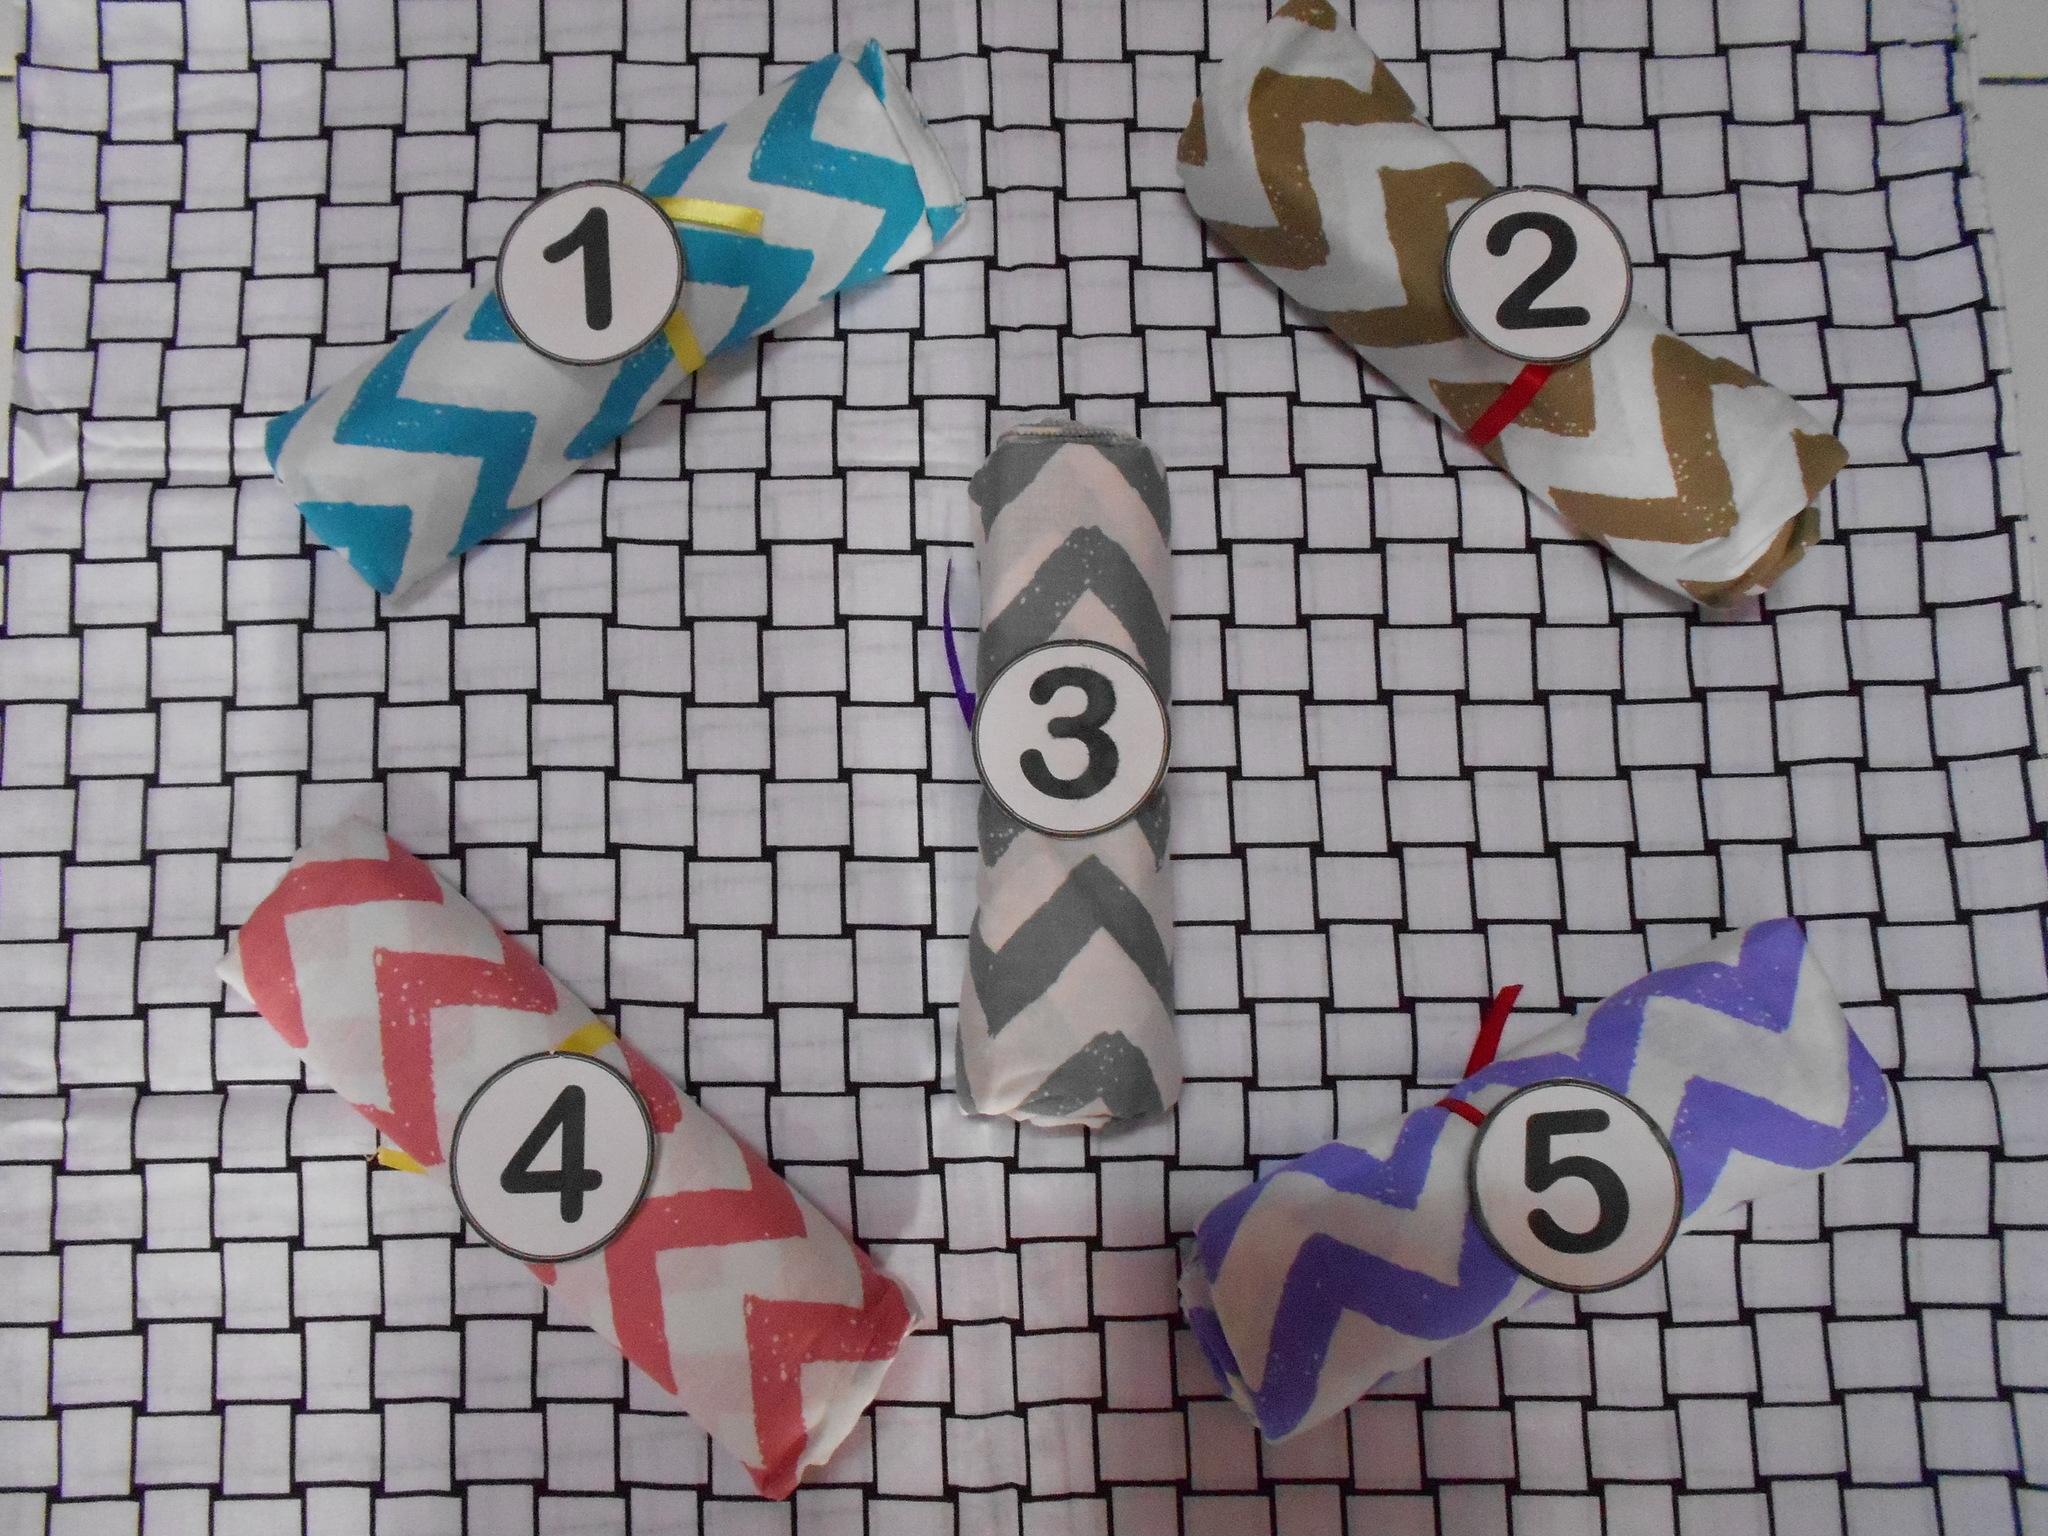 Jilbab Segi Empat Monochrome Zigzag SMZ1 (Grosir Kerudung/Hijab Murah